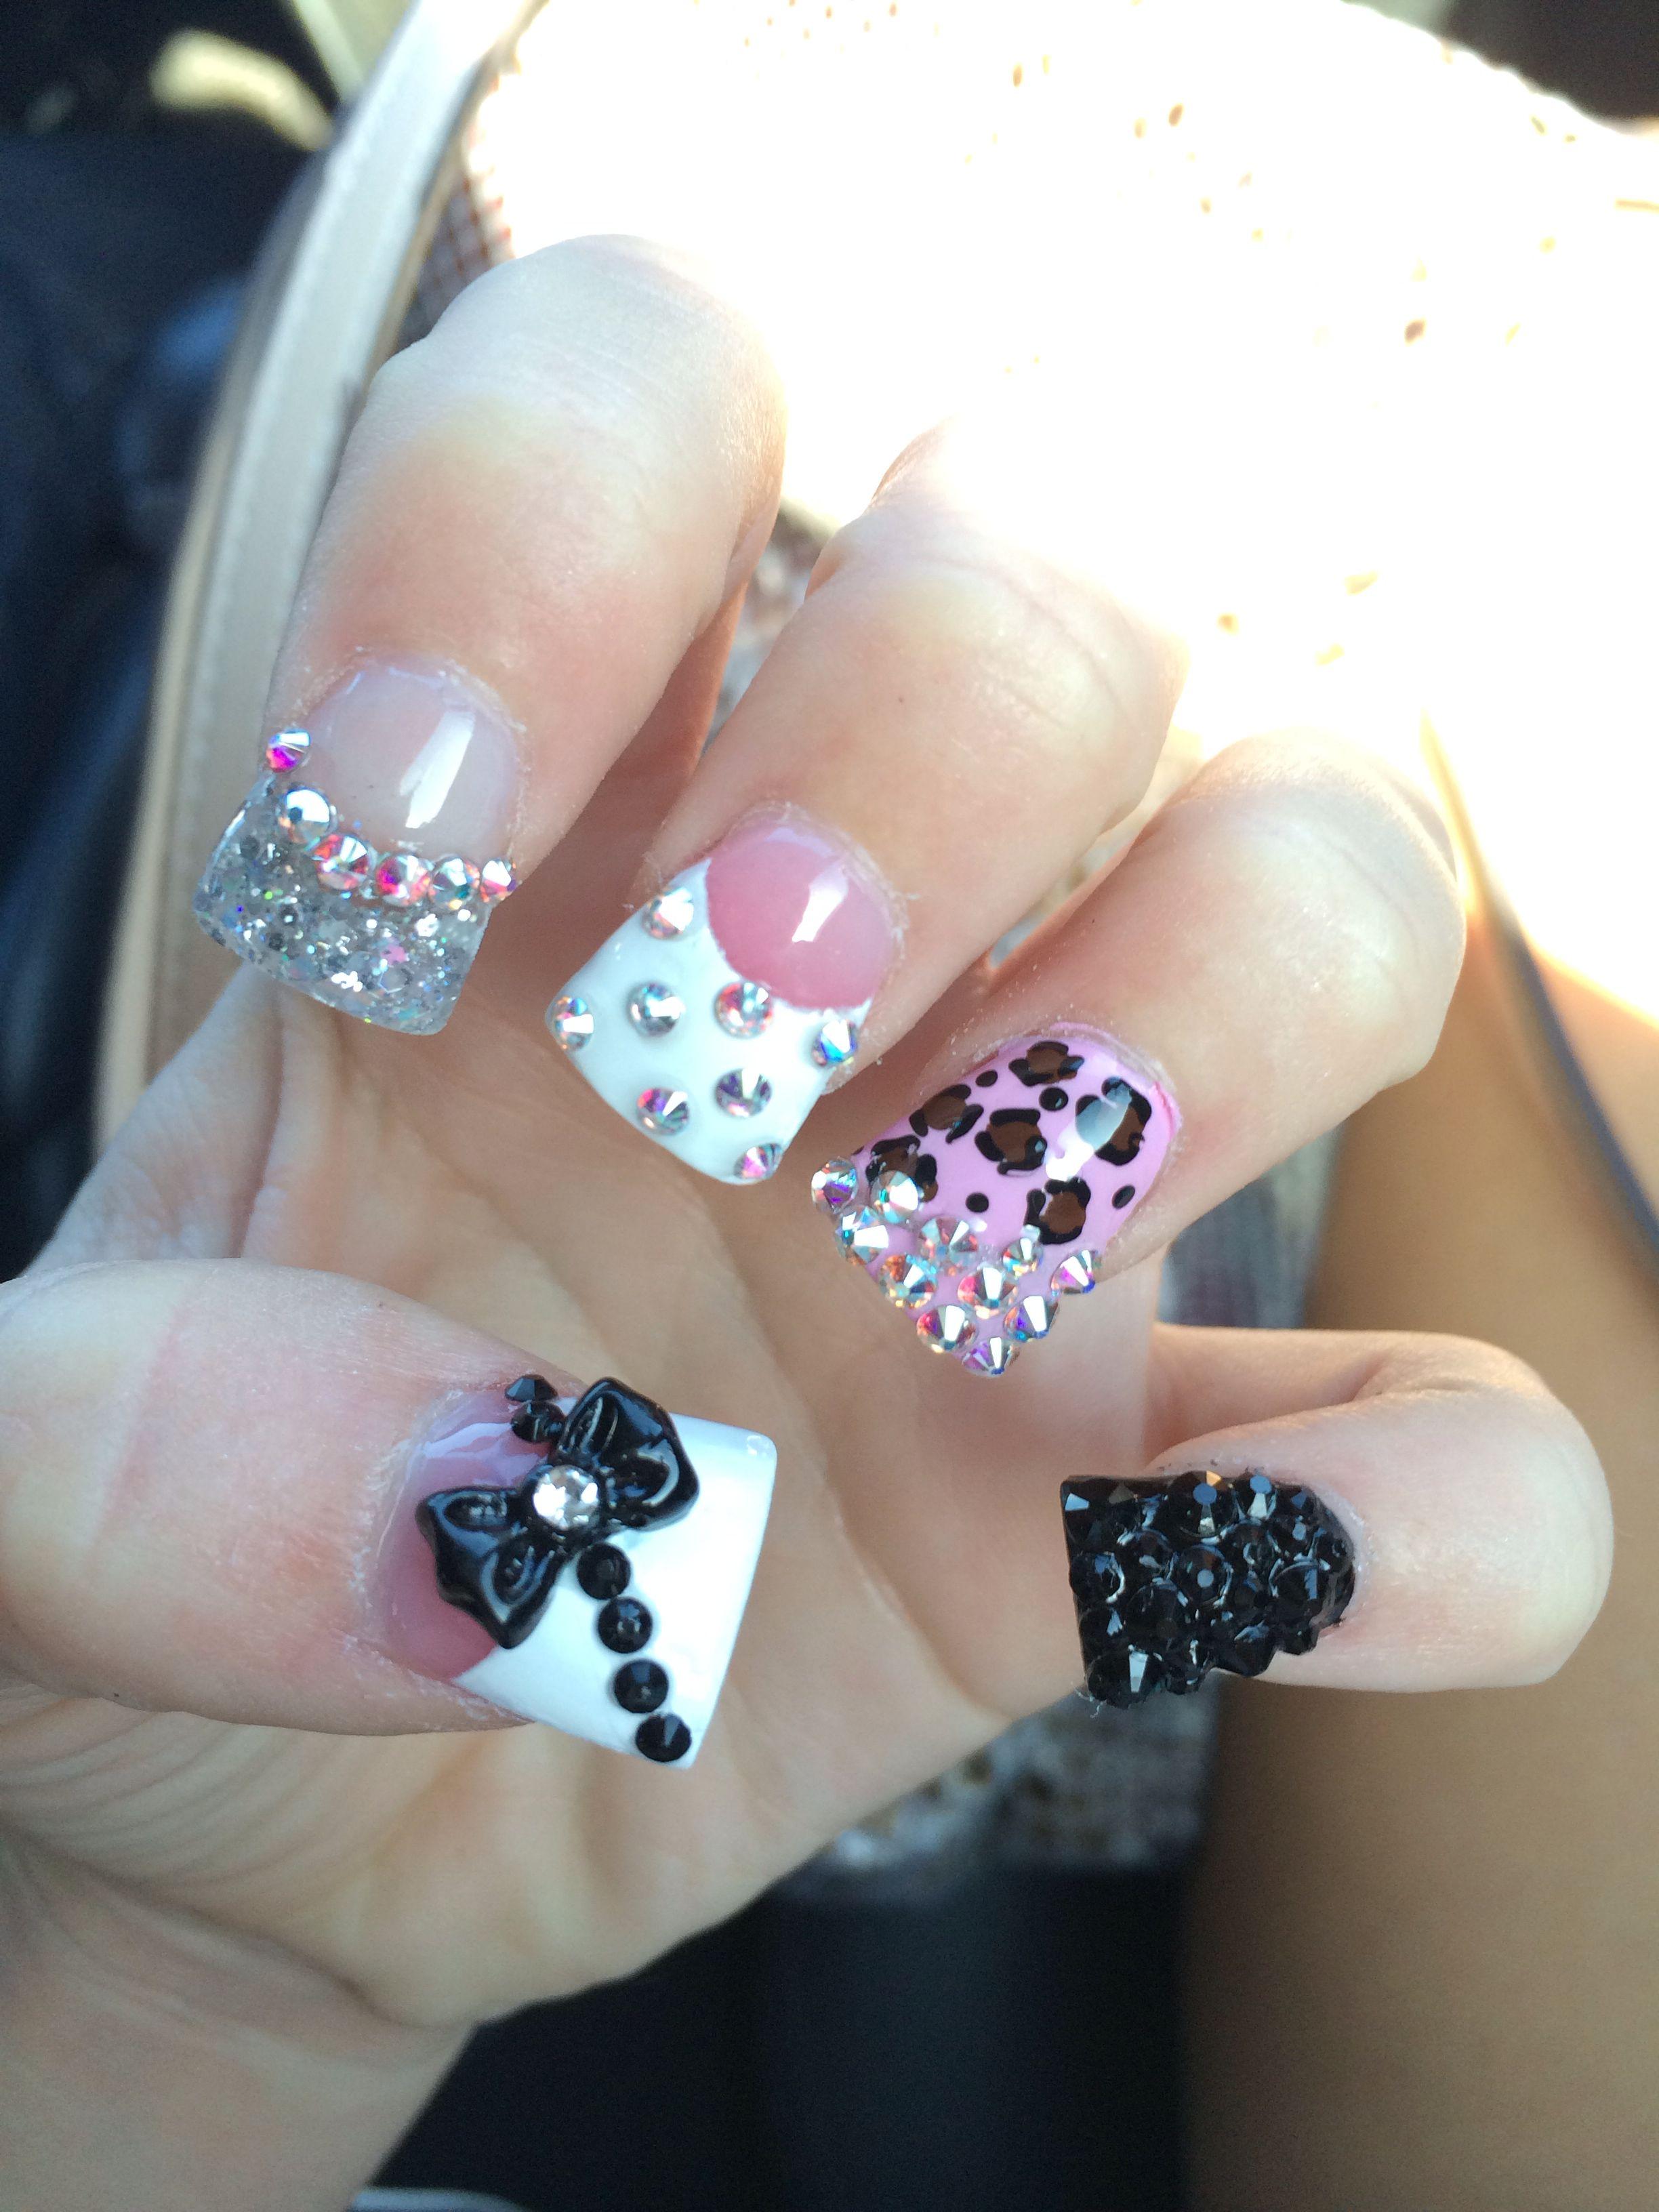 Acrylic nails #duckfeet #obsessed #rhinestones   Nails   Pinterest ...